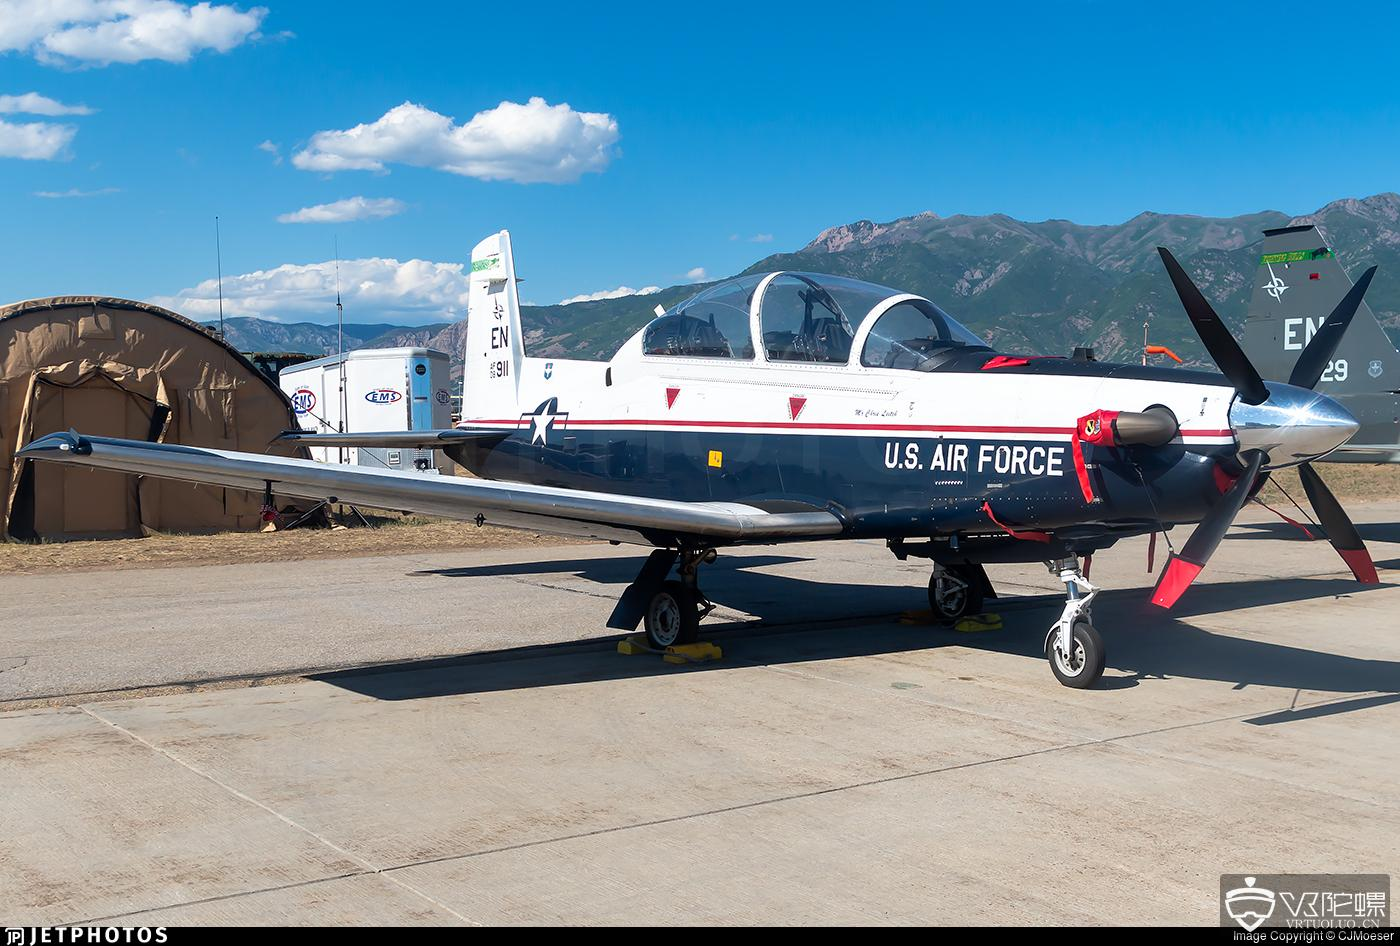 VR企业培训公司HTX Labs获美国空军VR培训SBIR计划第一阶段资助